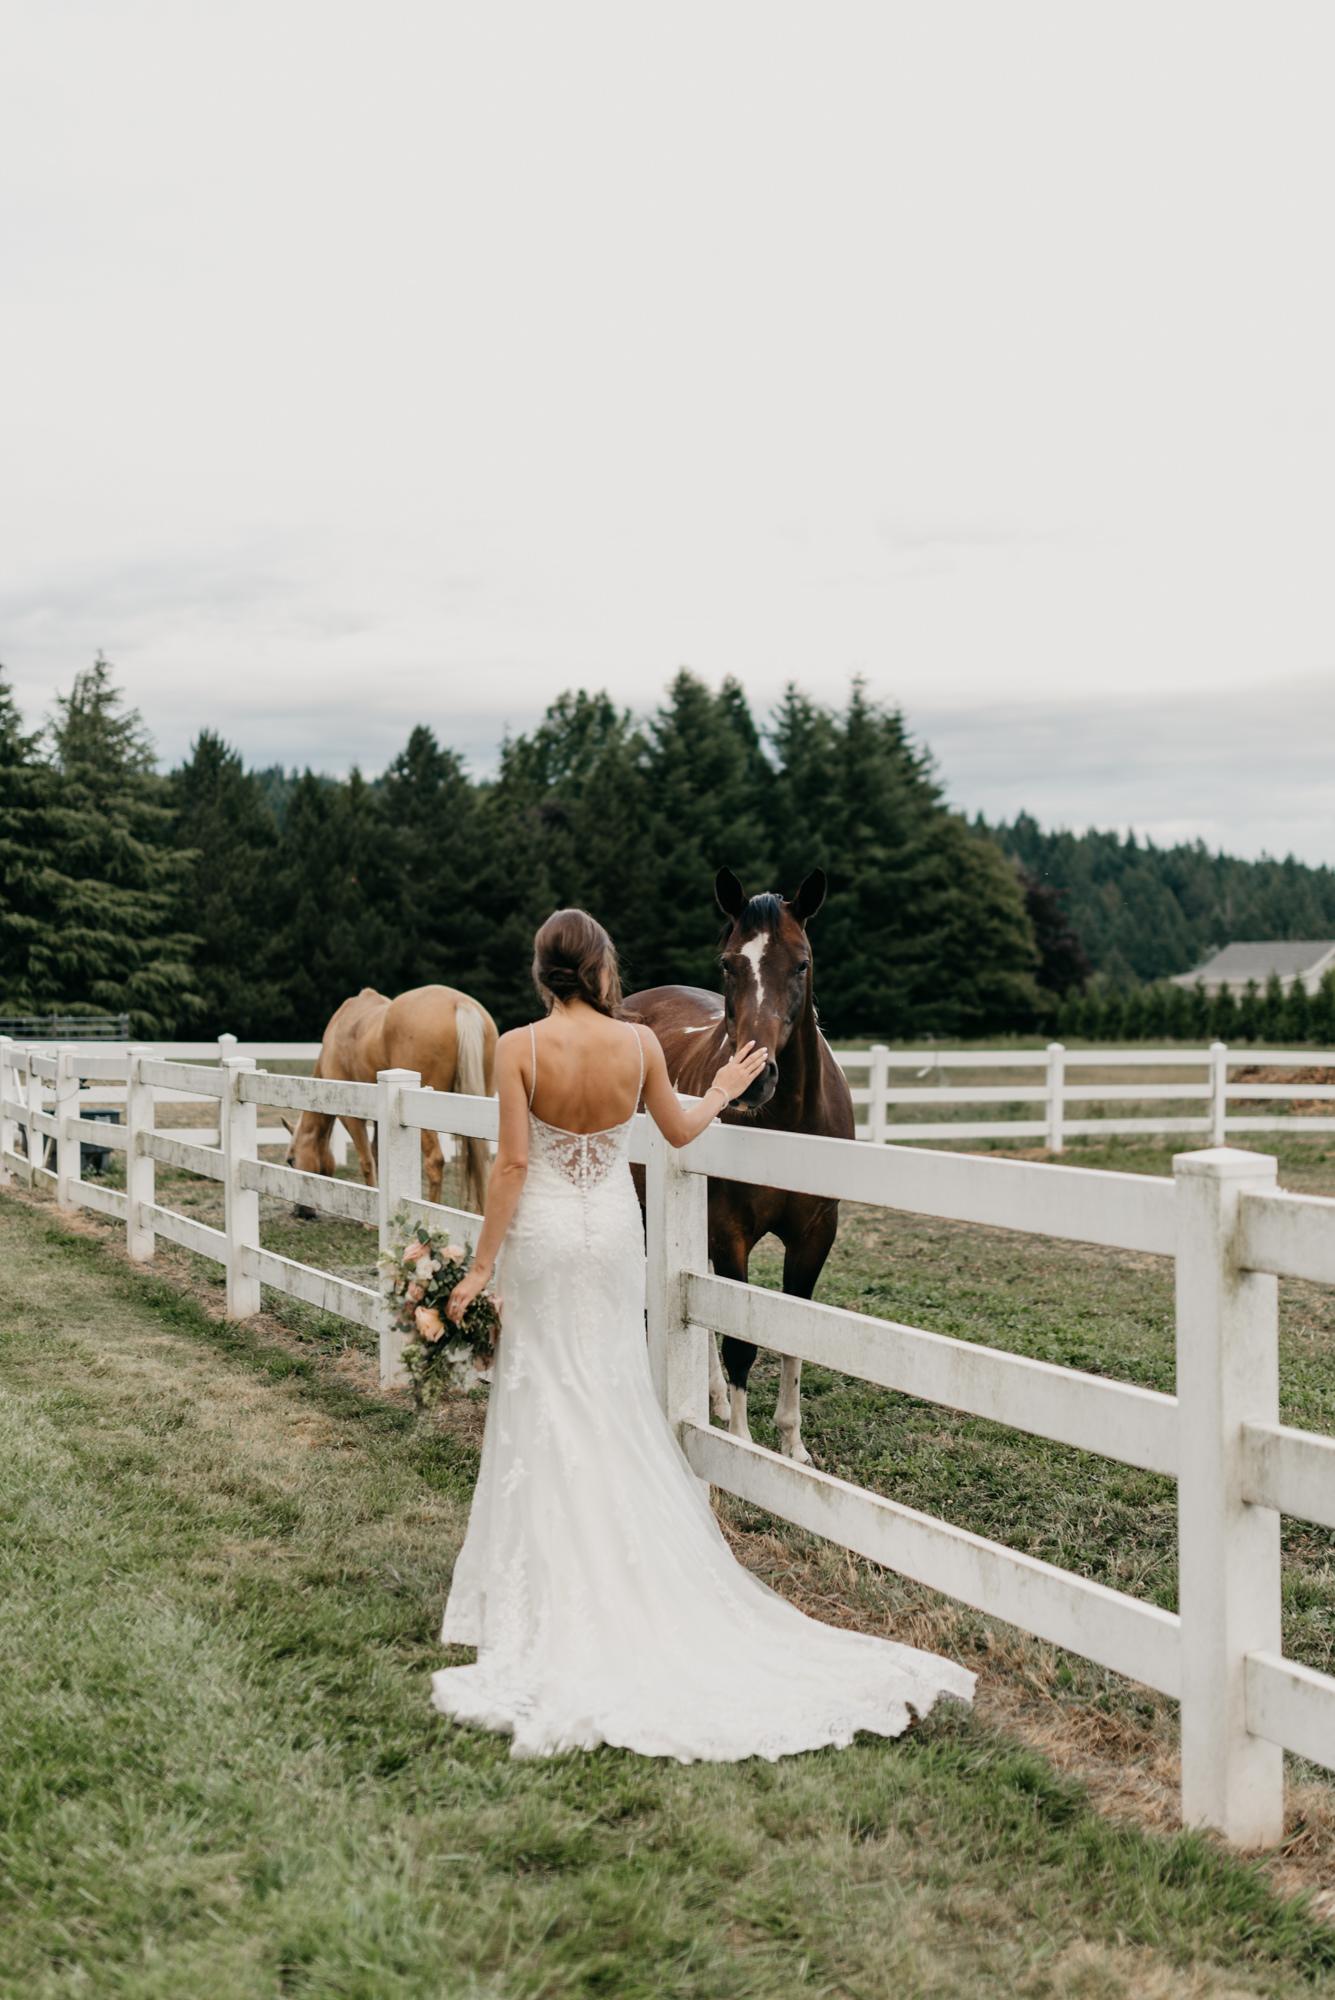 188-barn-kestrel-portland-northwest-horse-sunset-wedding.jpg